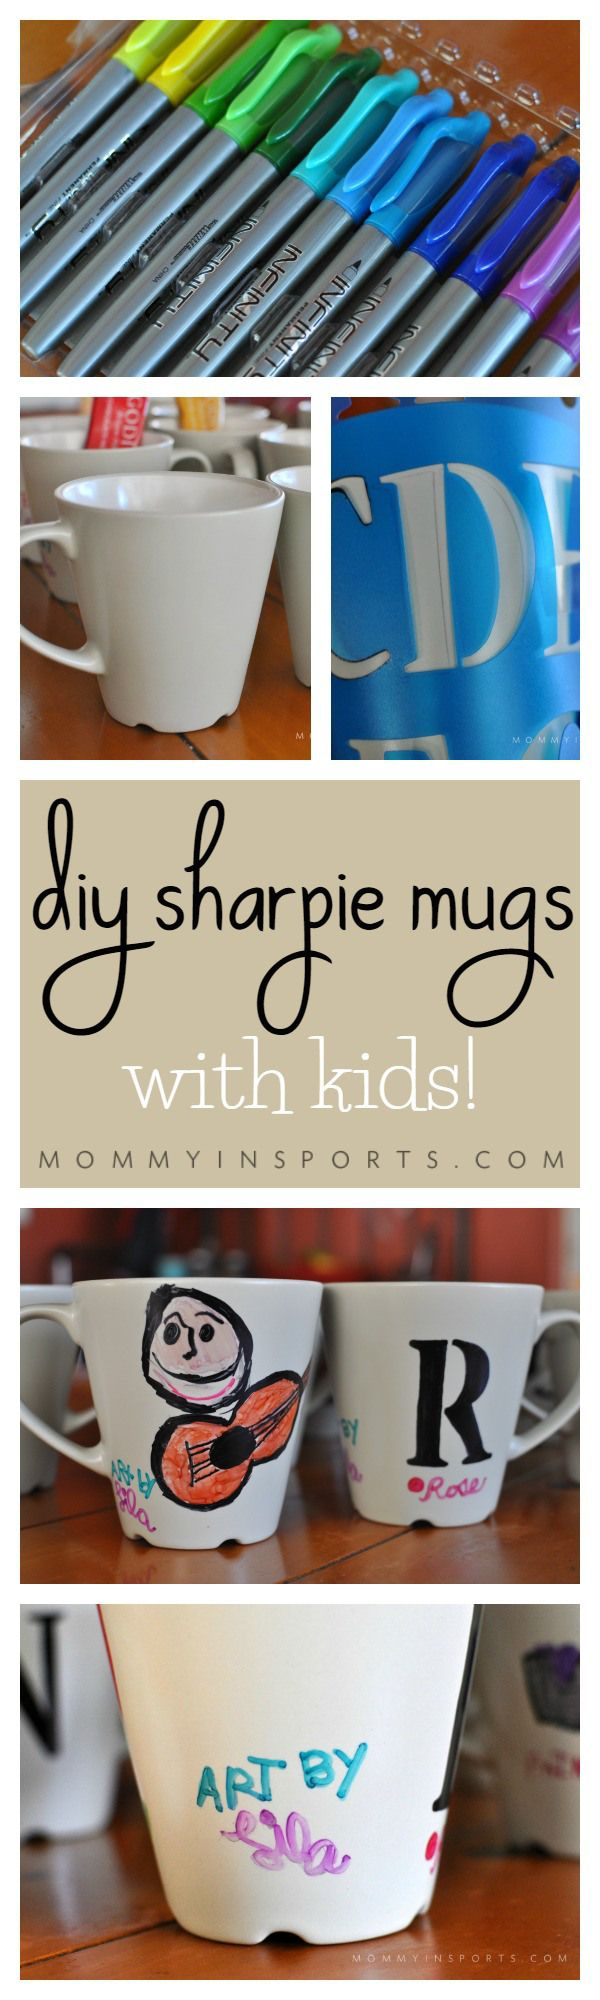 DIY Sharpie Mugs With Kids Crafts Christmas Gift Ideas